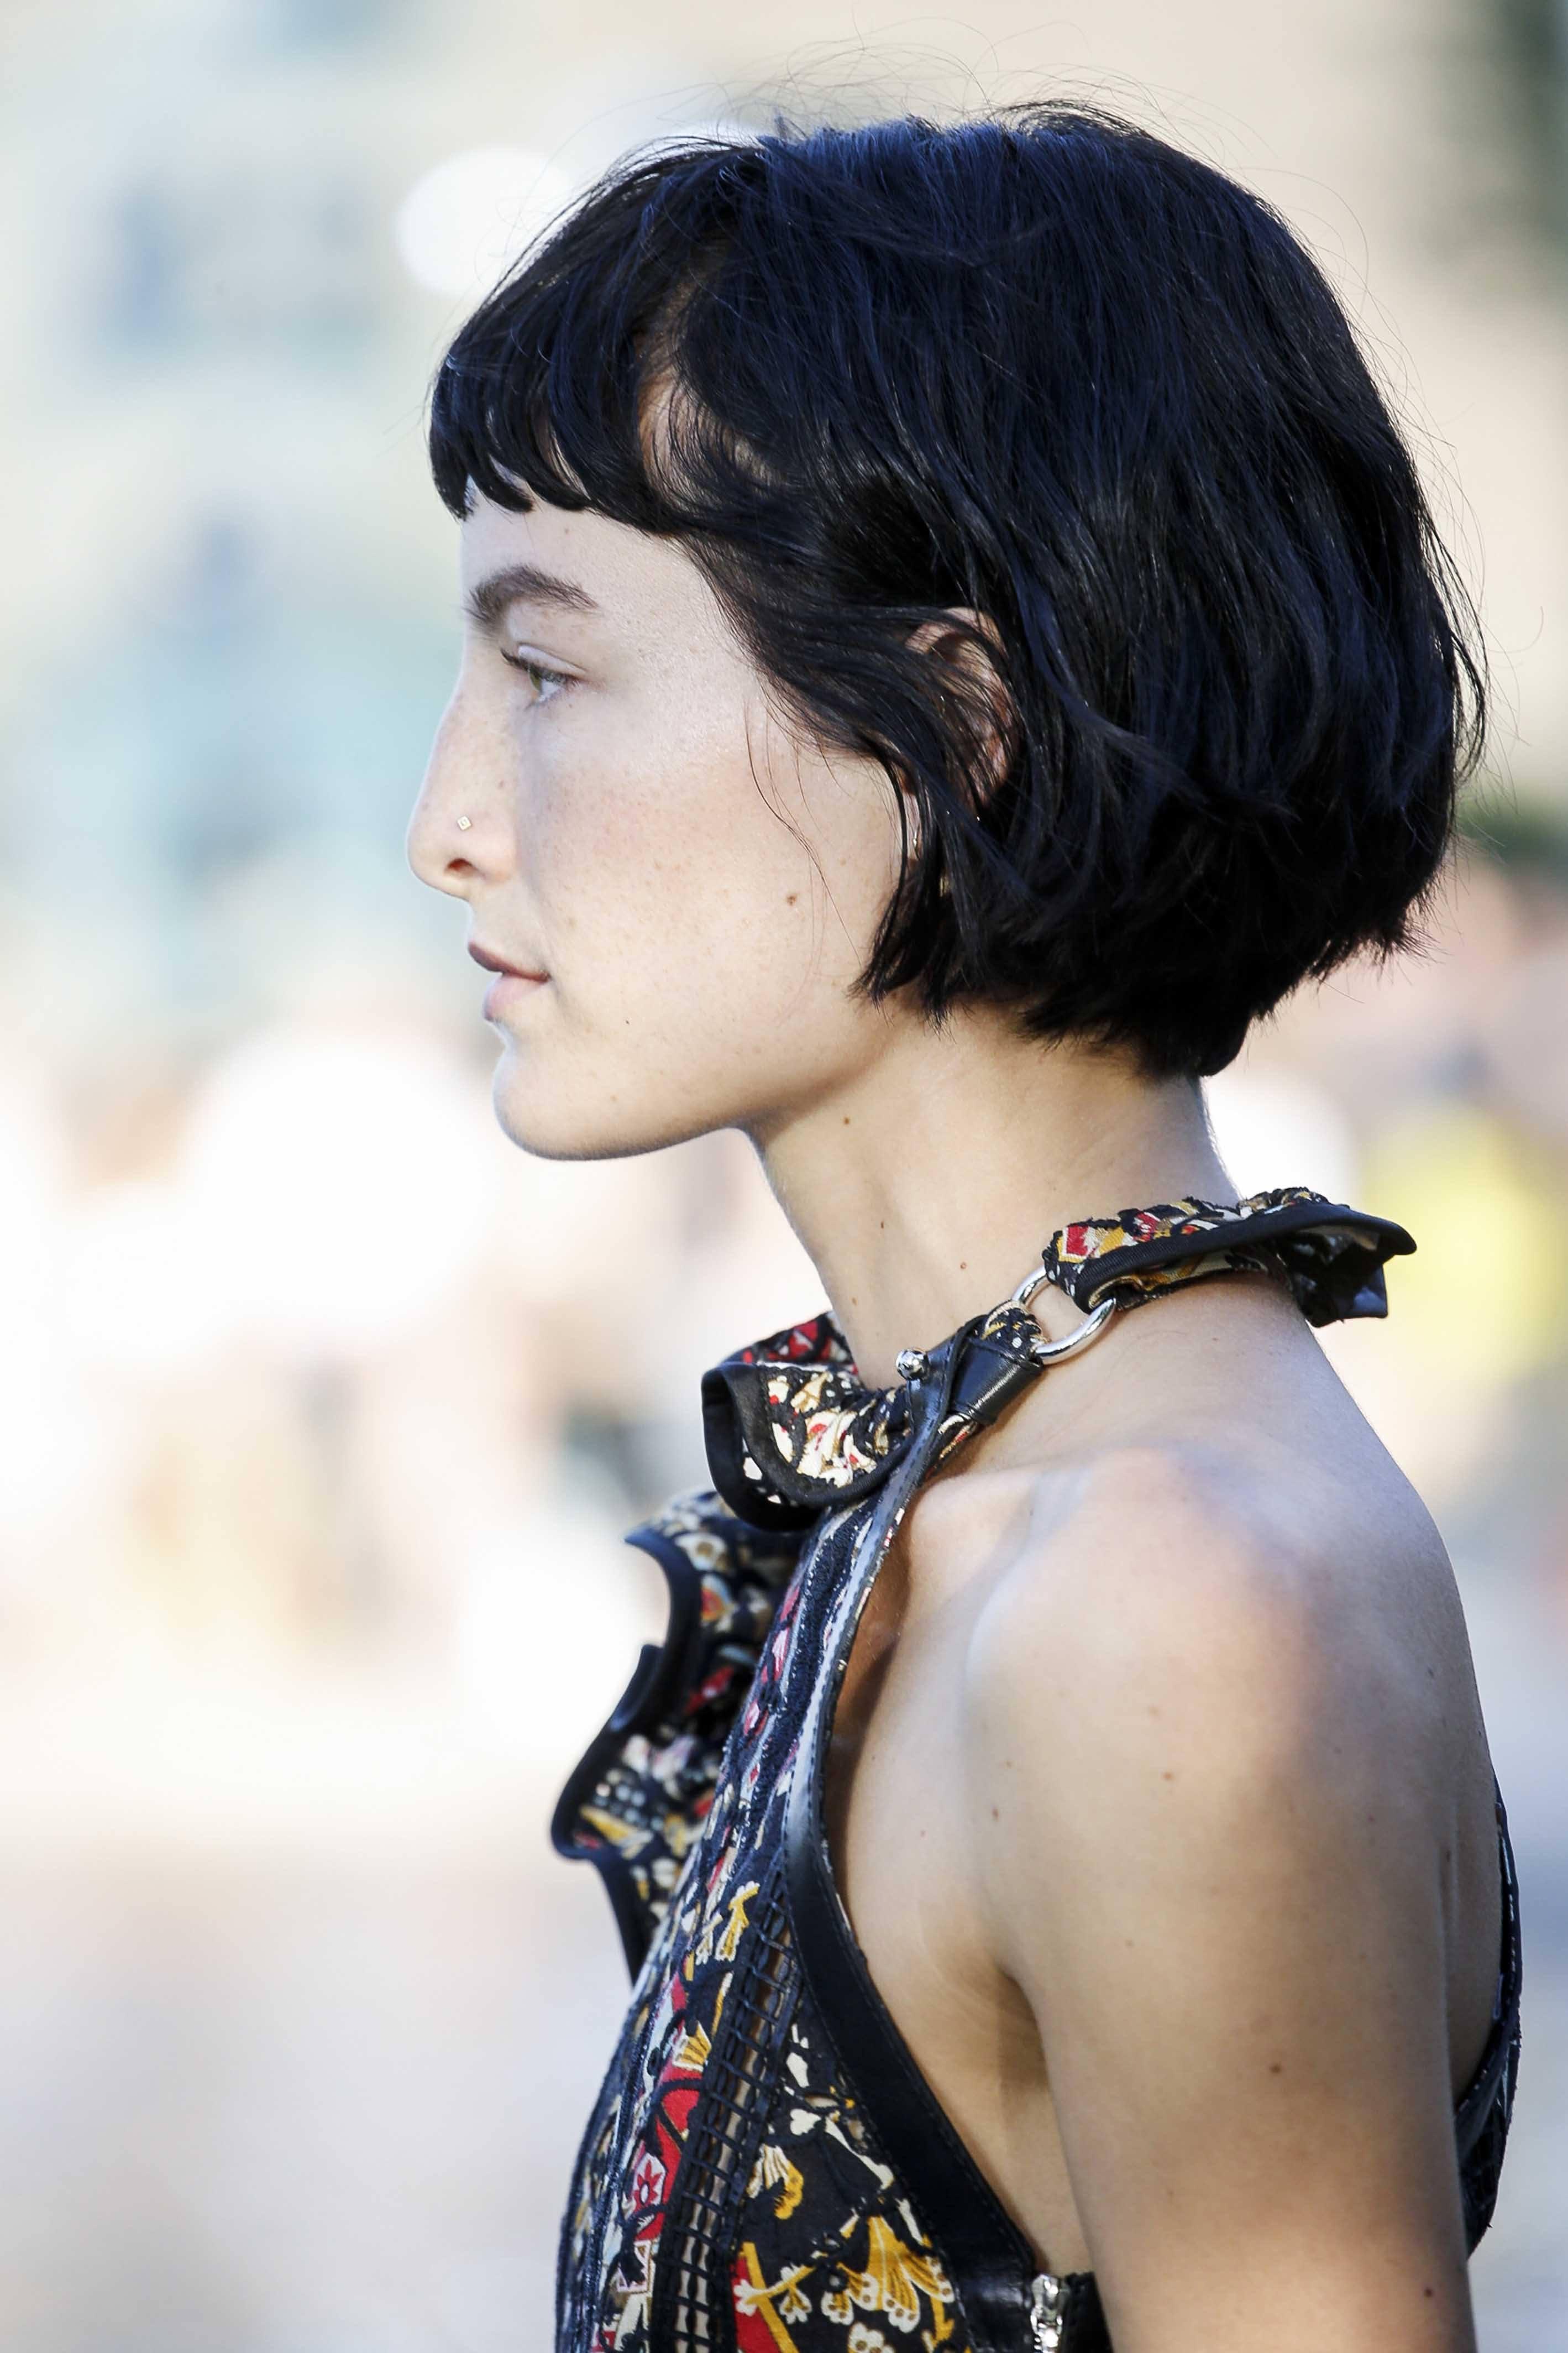 modelo de cabelo chanel com franja curta